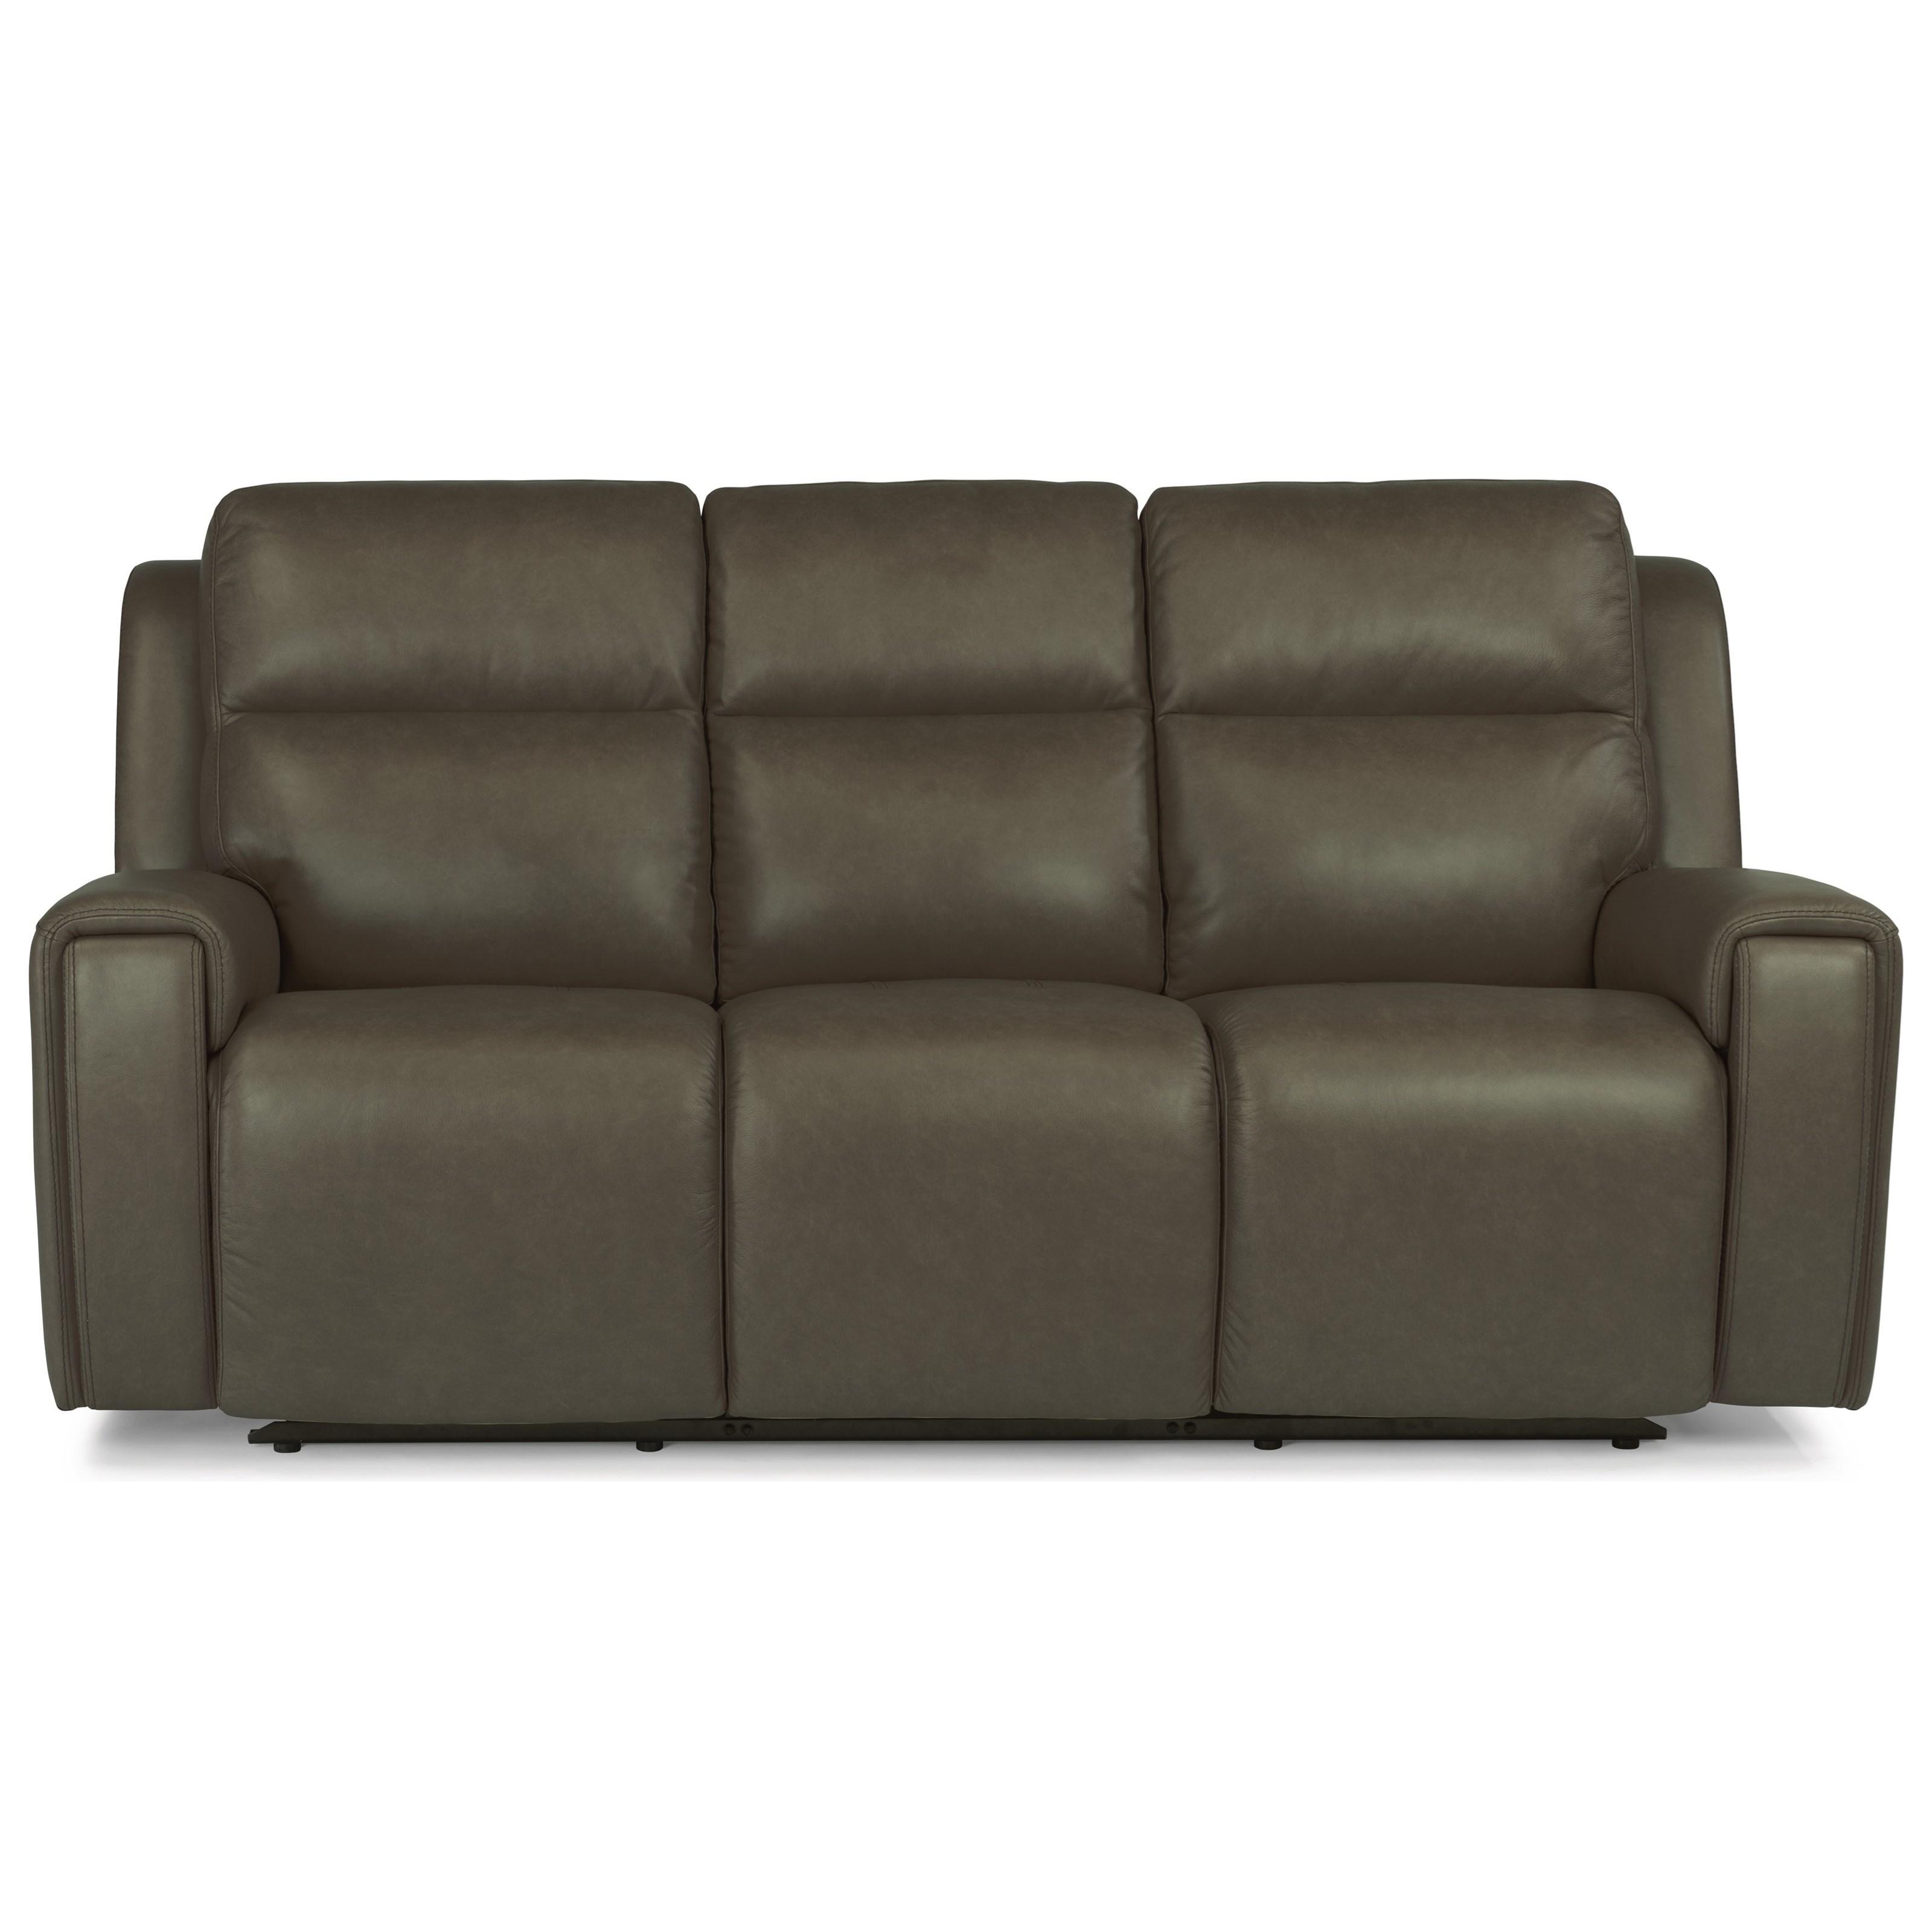 Flexsteel Furniture Uk: Jasper Contemporary Power Reclining